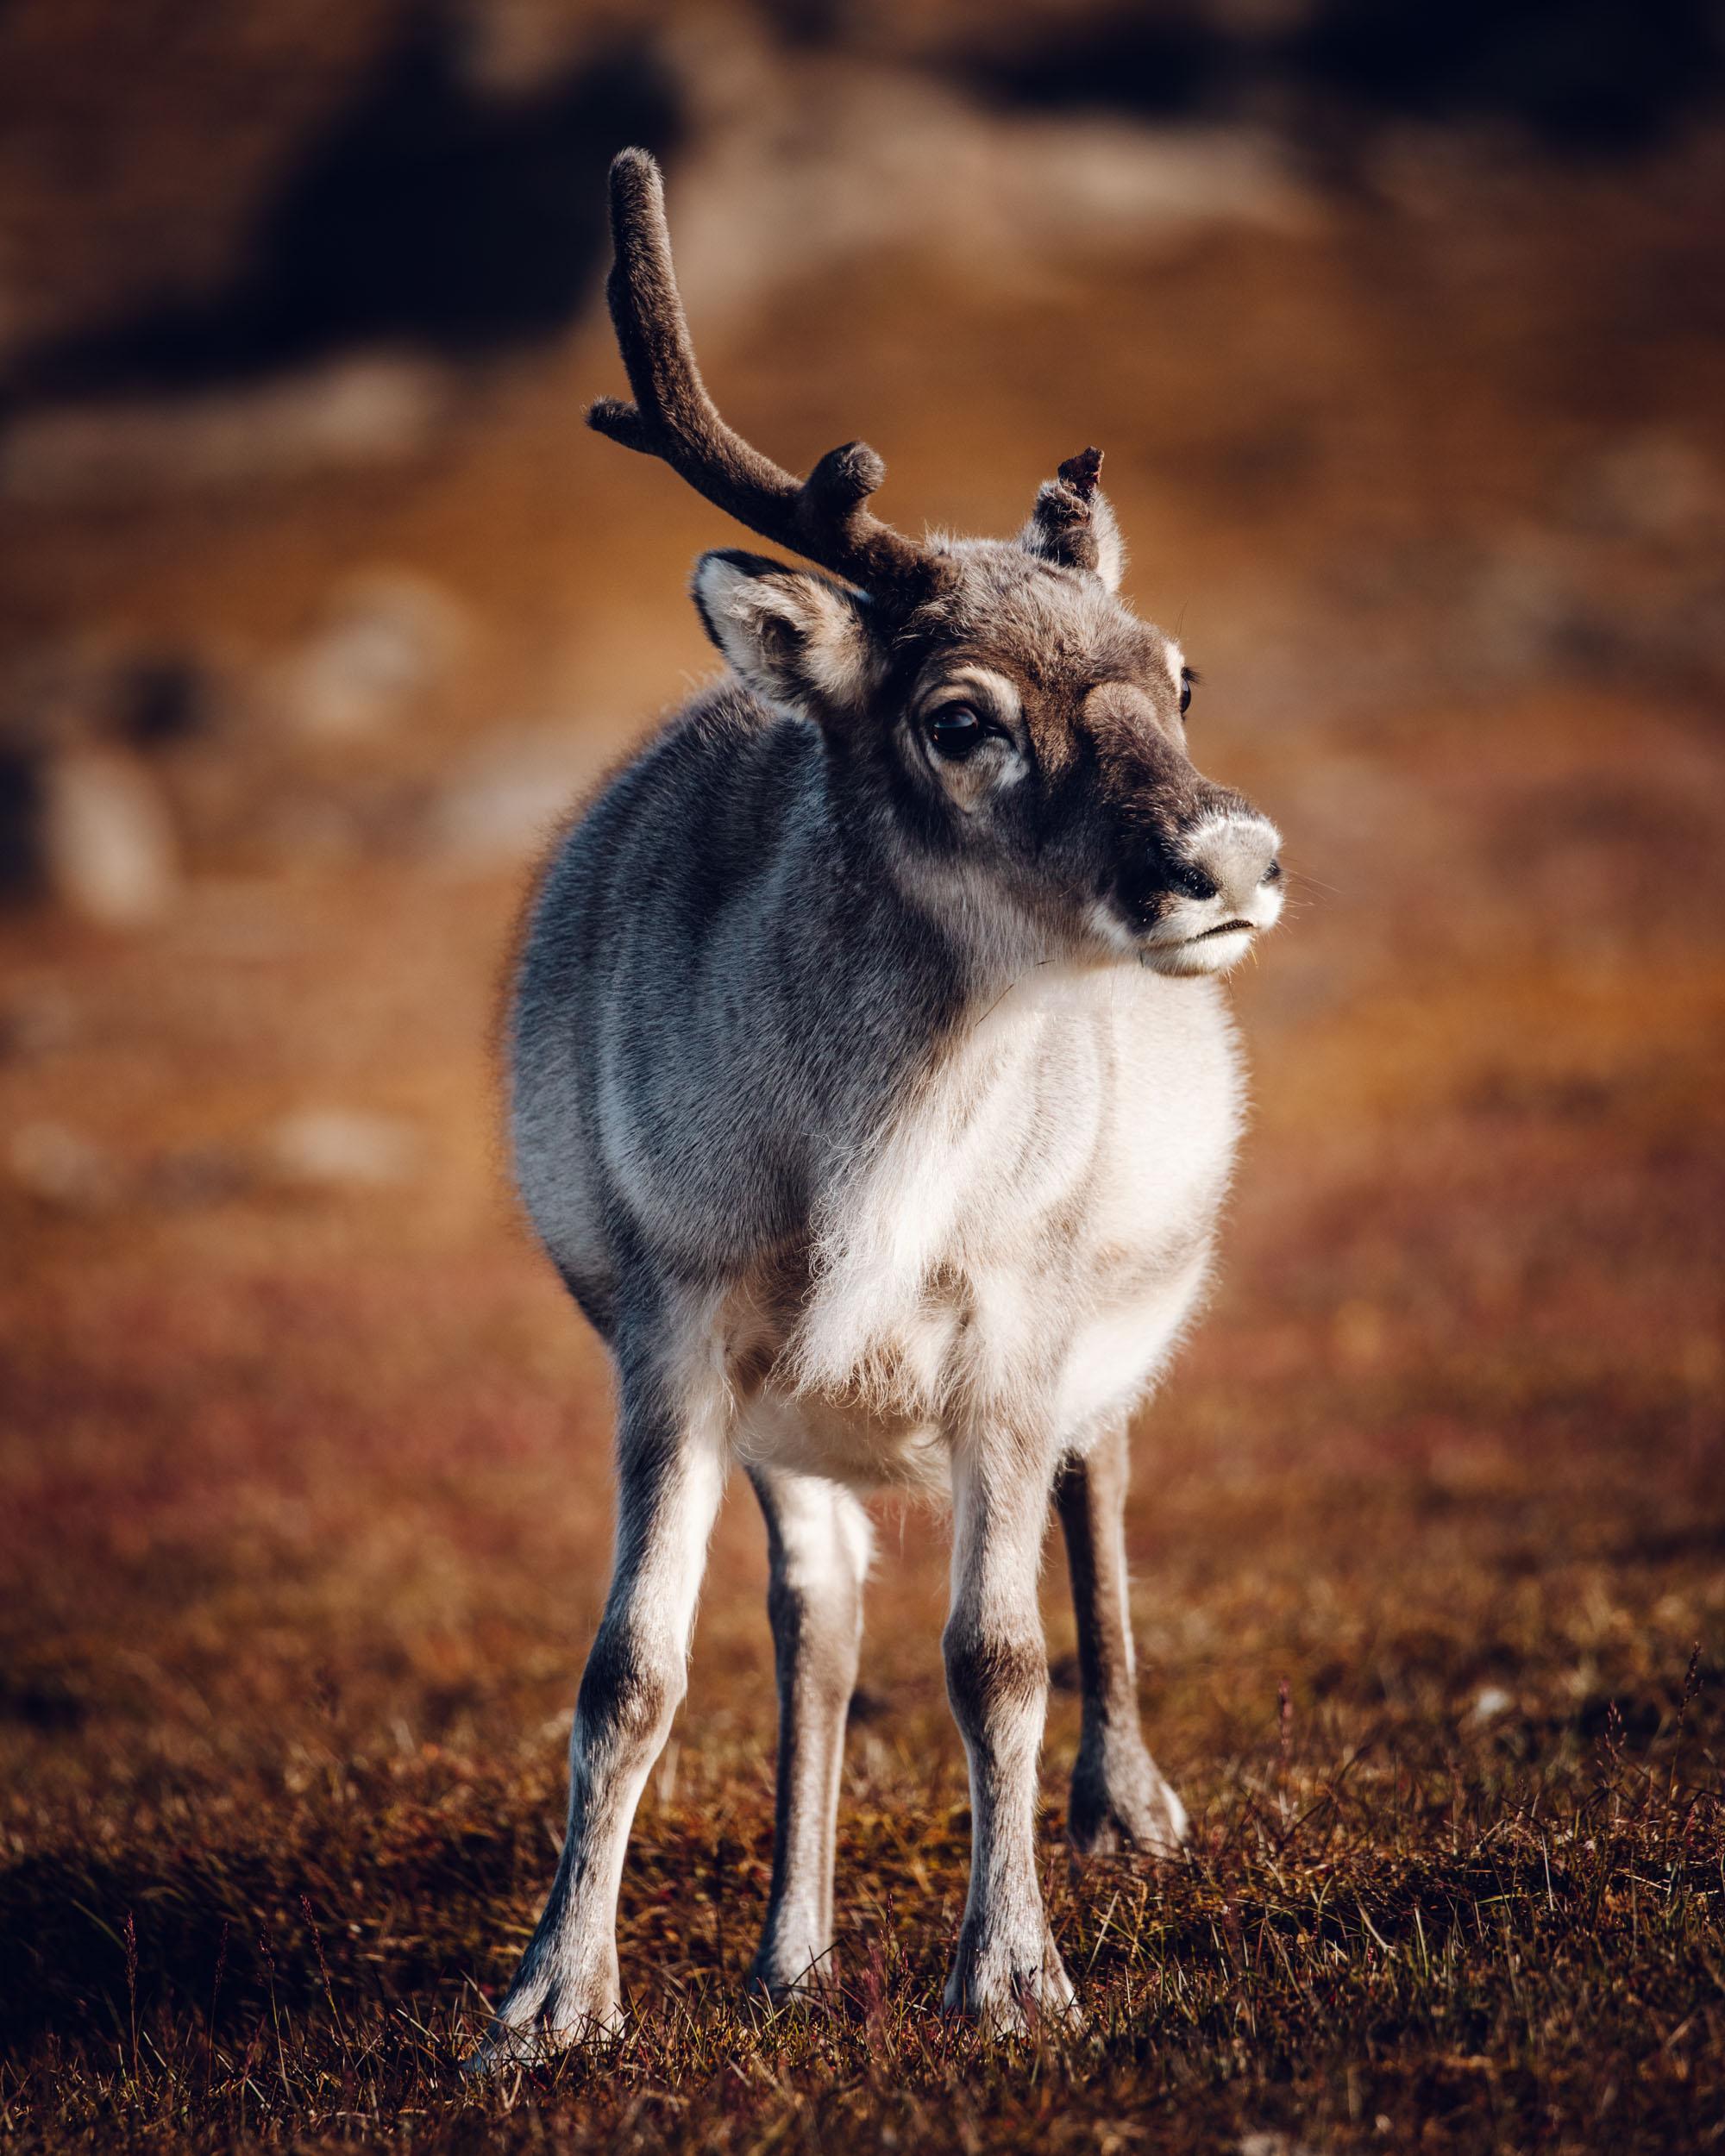 Svalbard reindeer in the valley in Spitsbergen, Svalbard, Norway